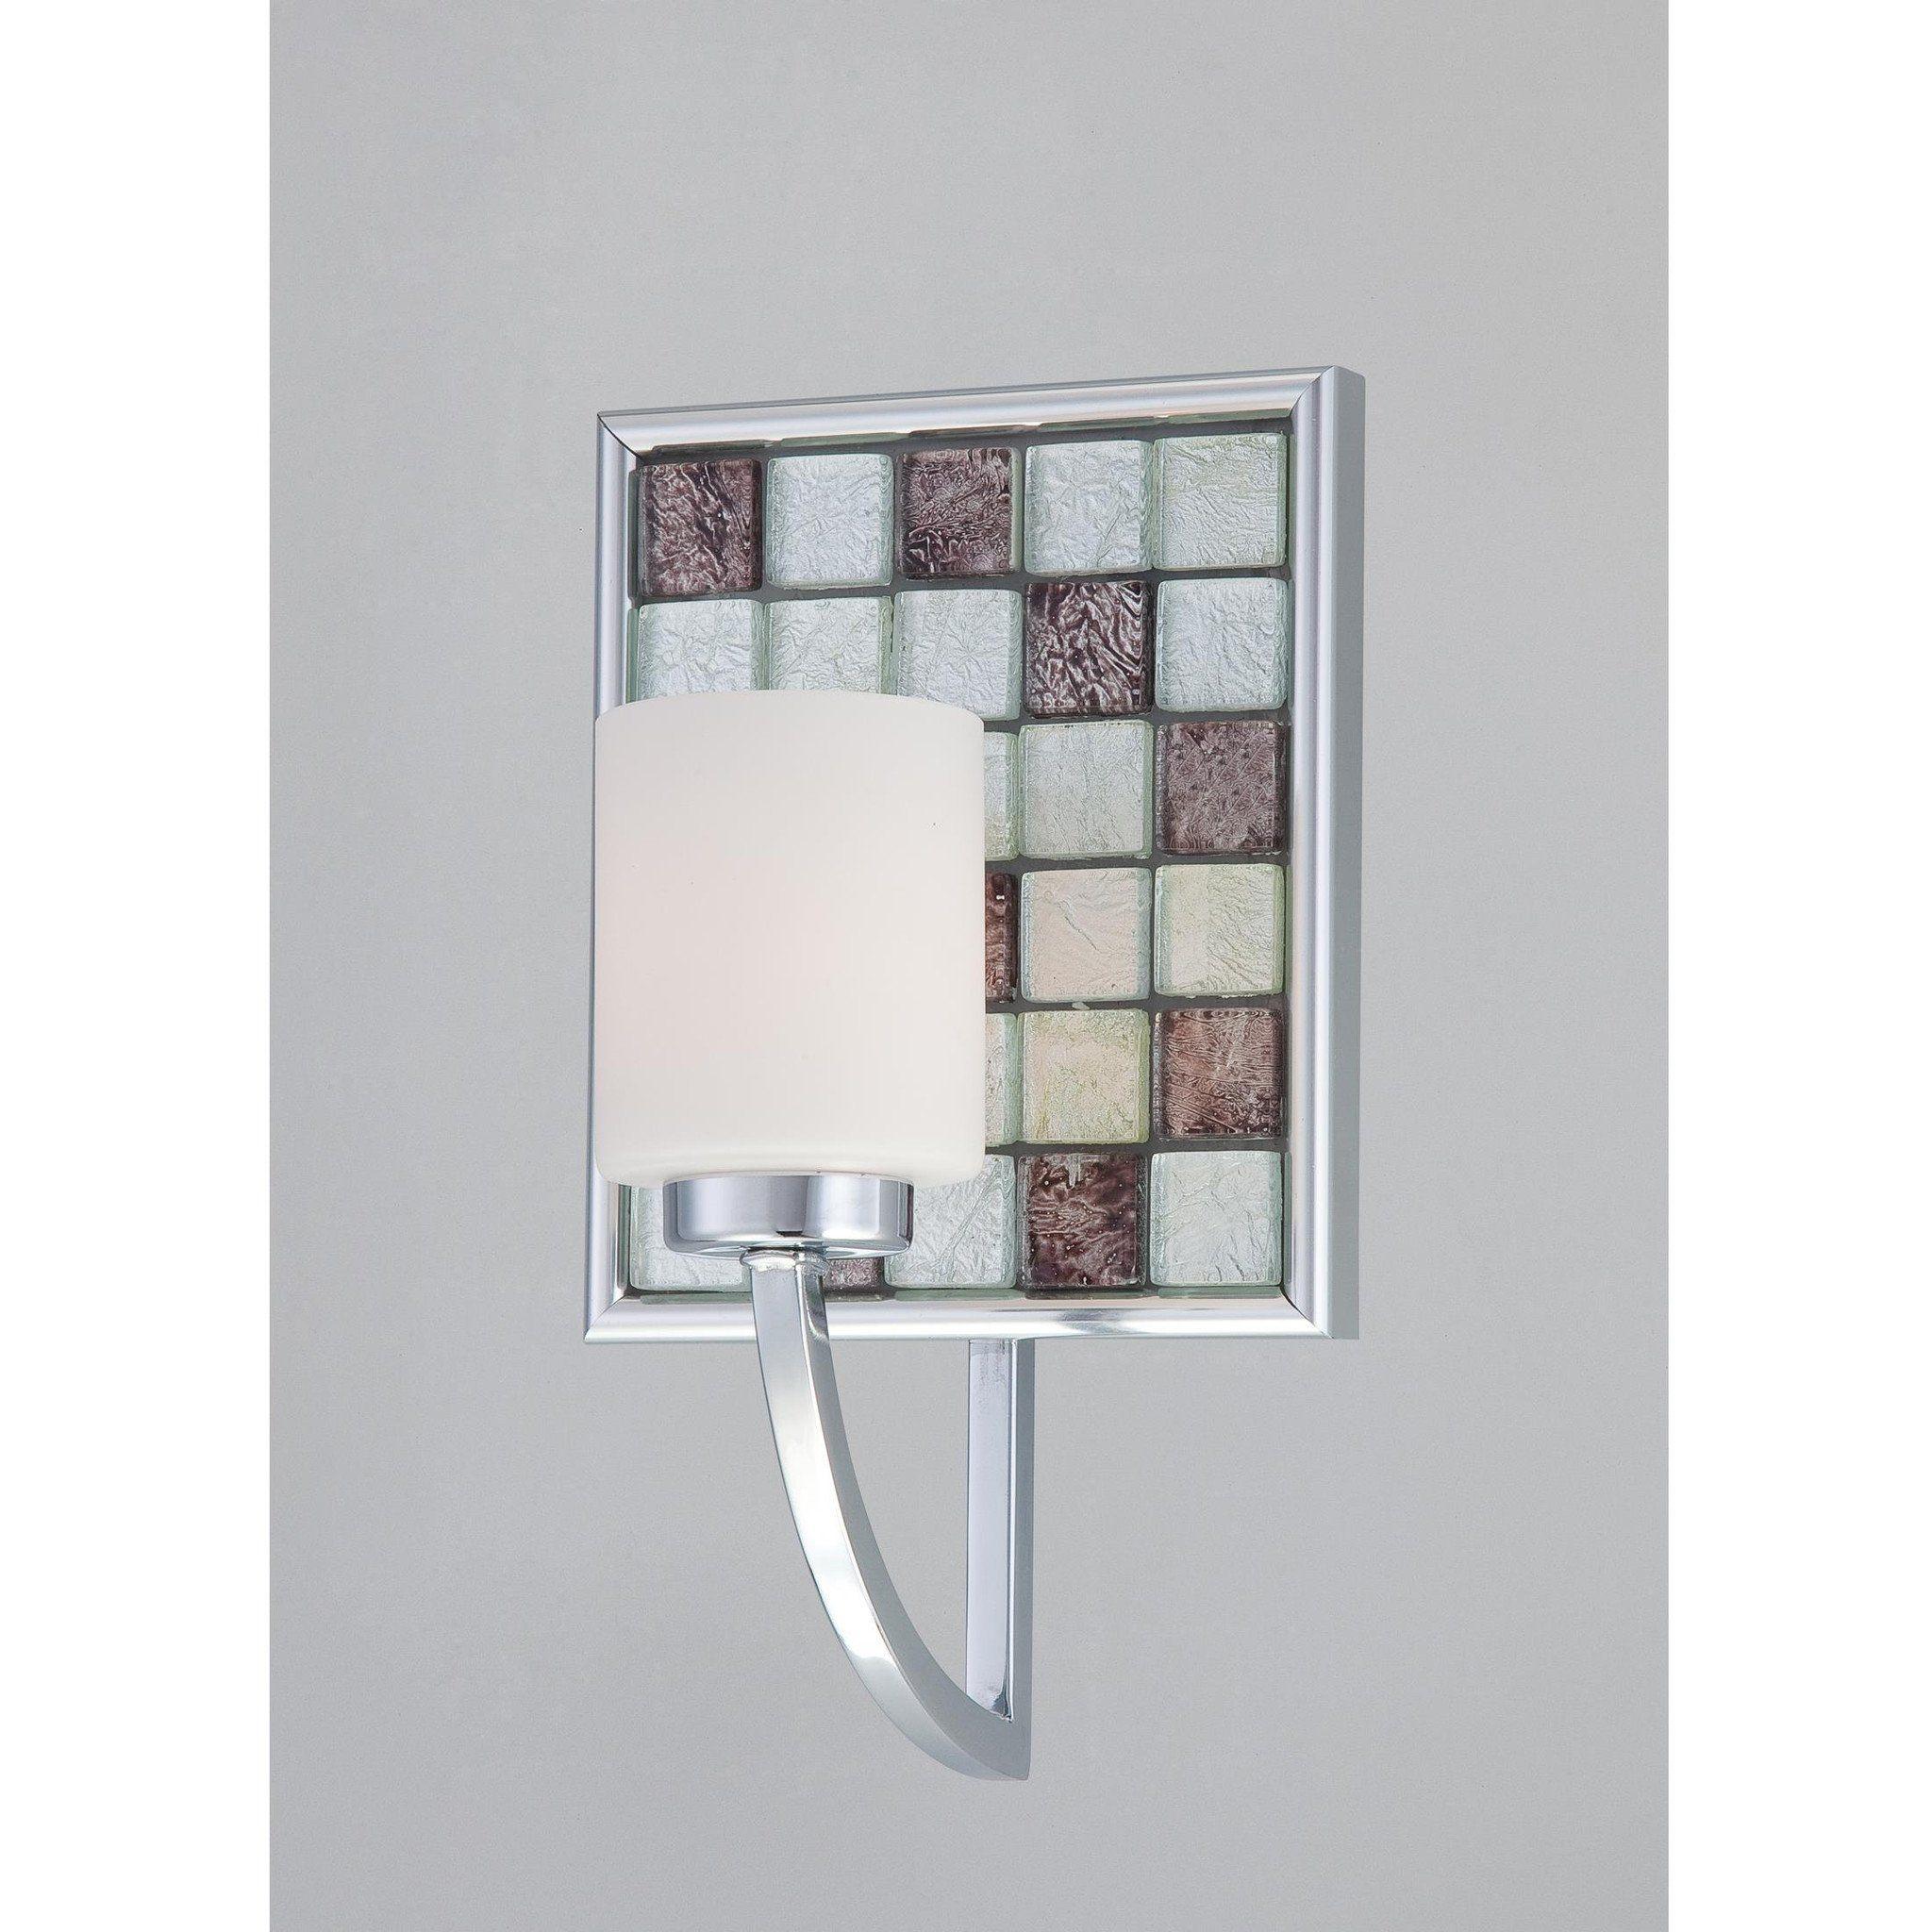 Quoizel lighting vtrtc vetreo retro collection one light wall